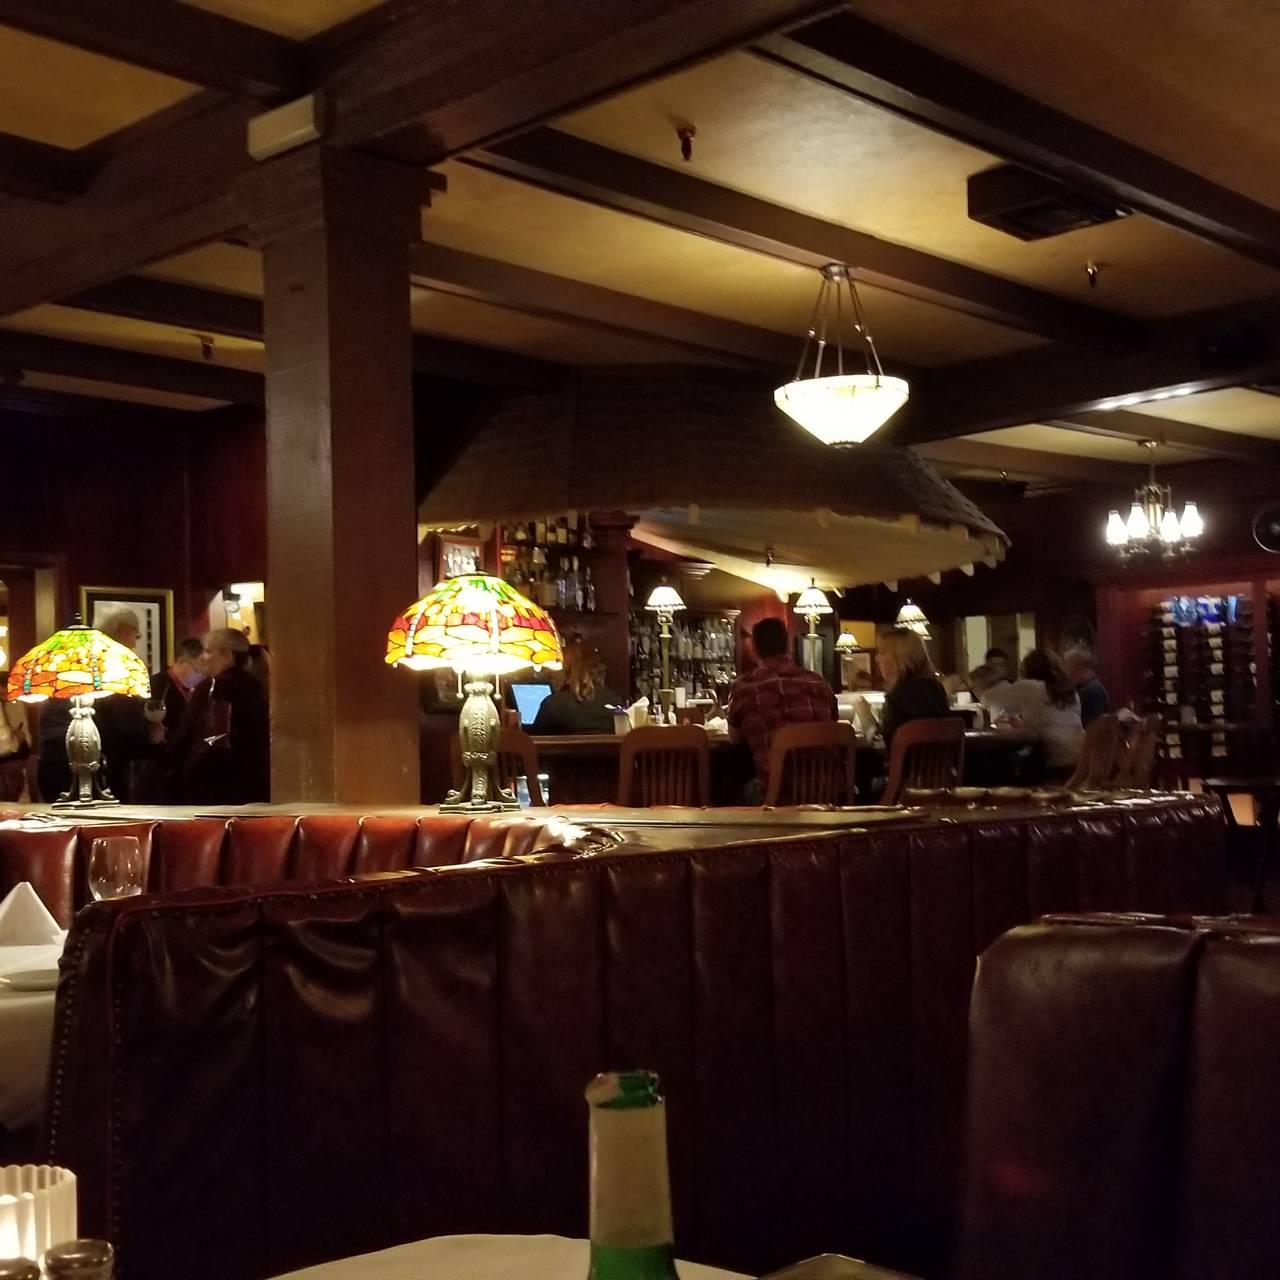 The Sycamore Inn Prime Steak House